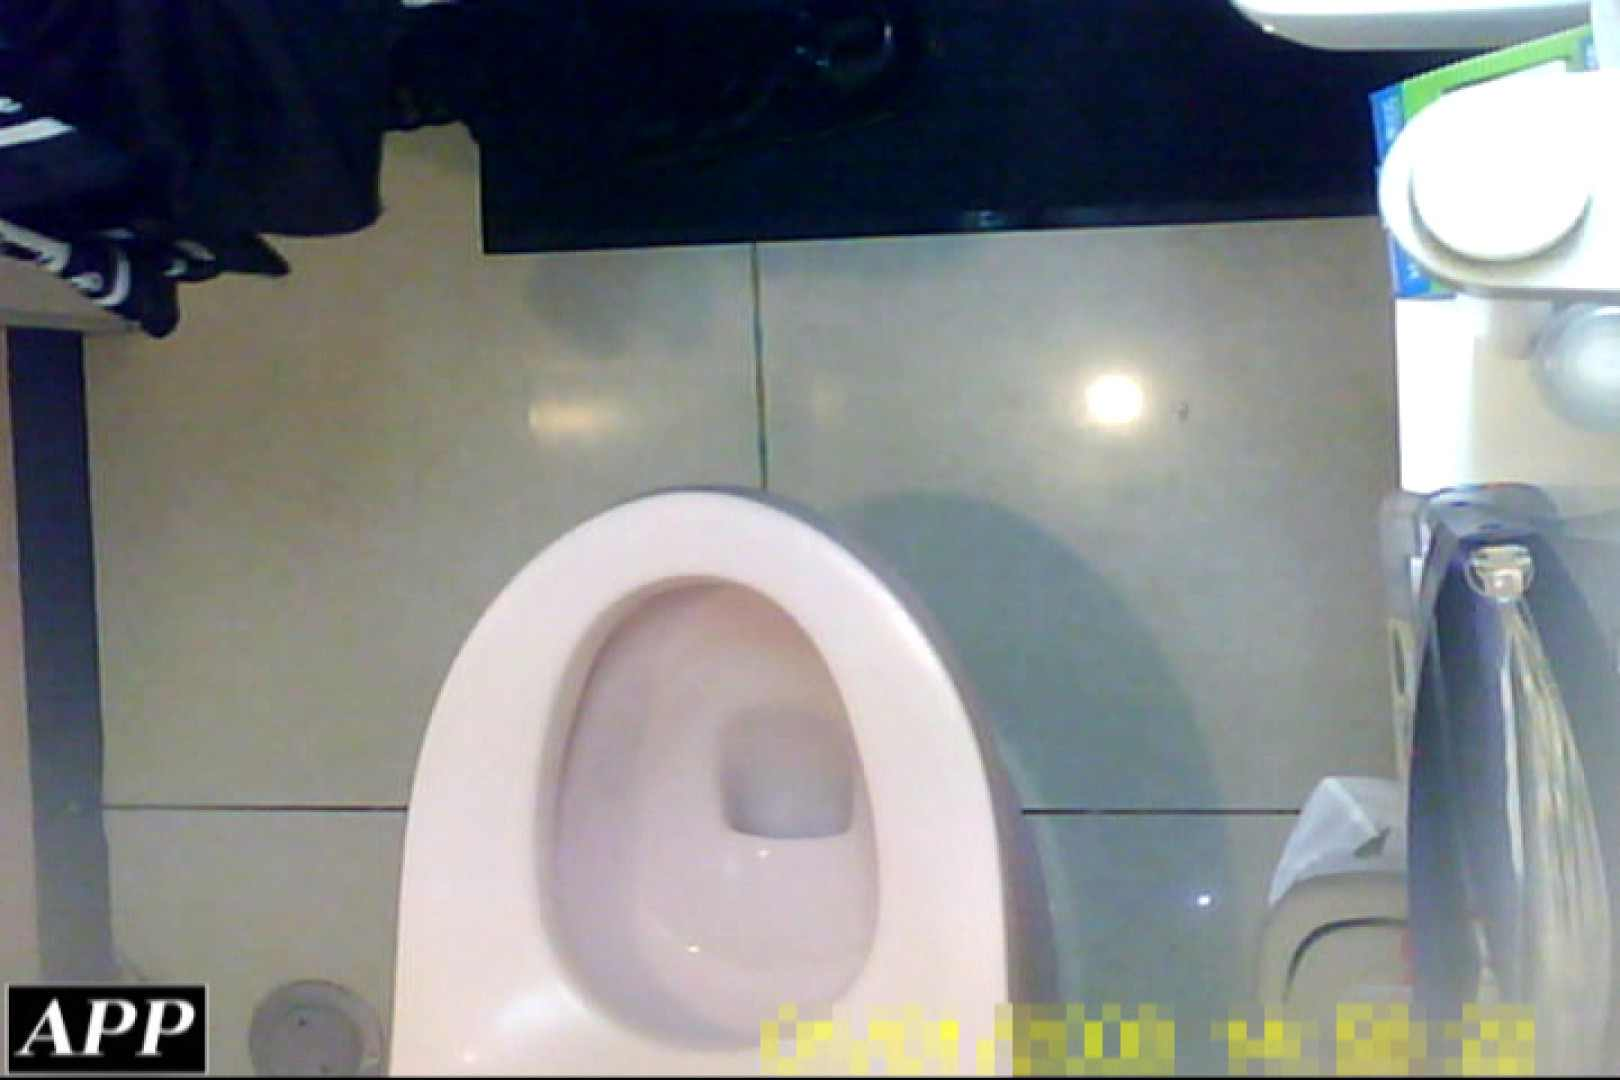 3視点洗面所 vol.097 OLエロ画像  55PICs 48